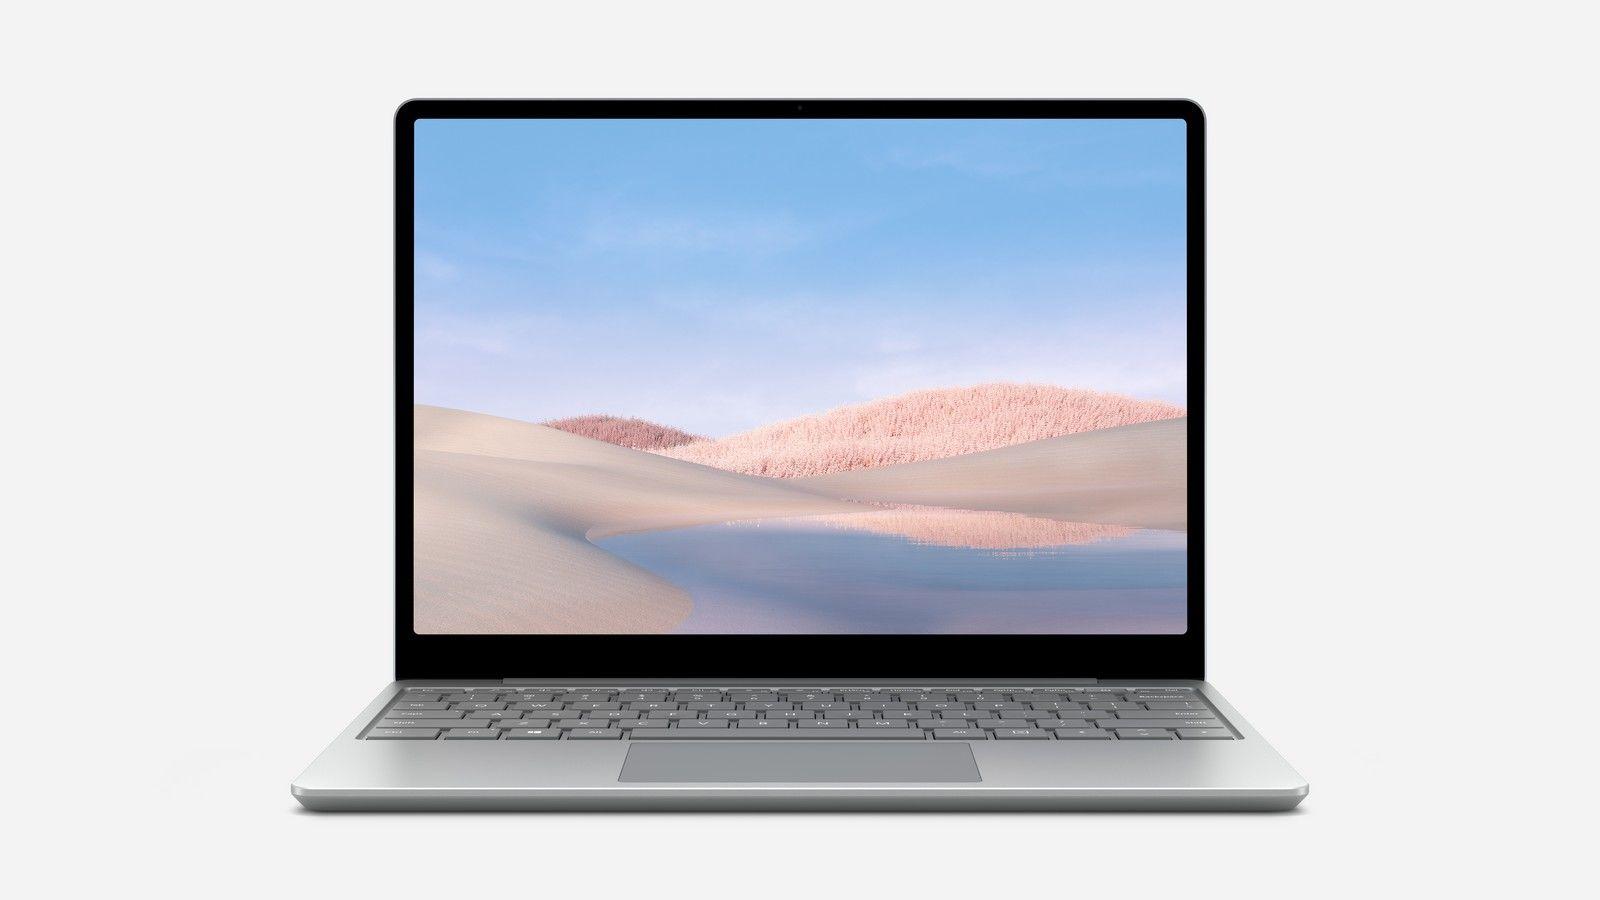 Surface Laptop Go image